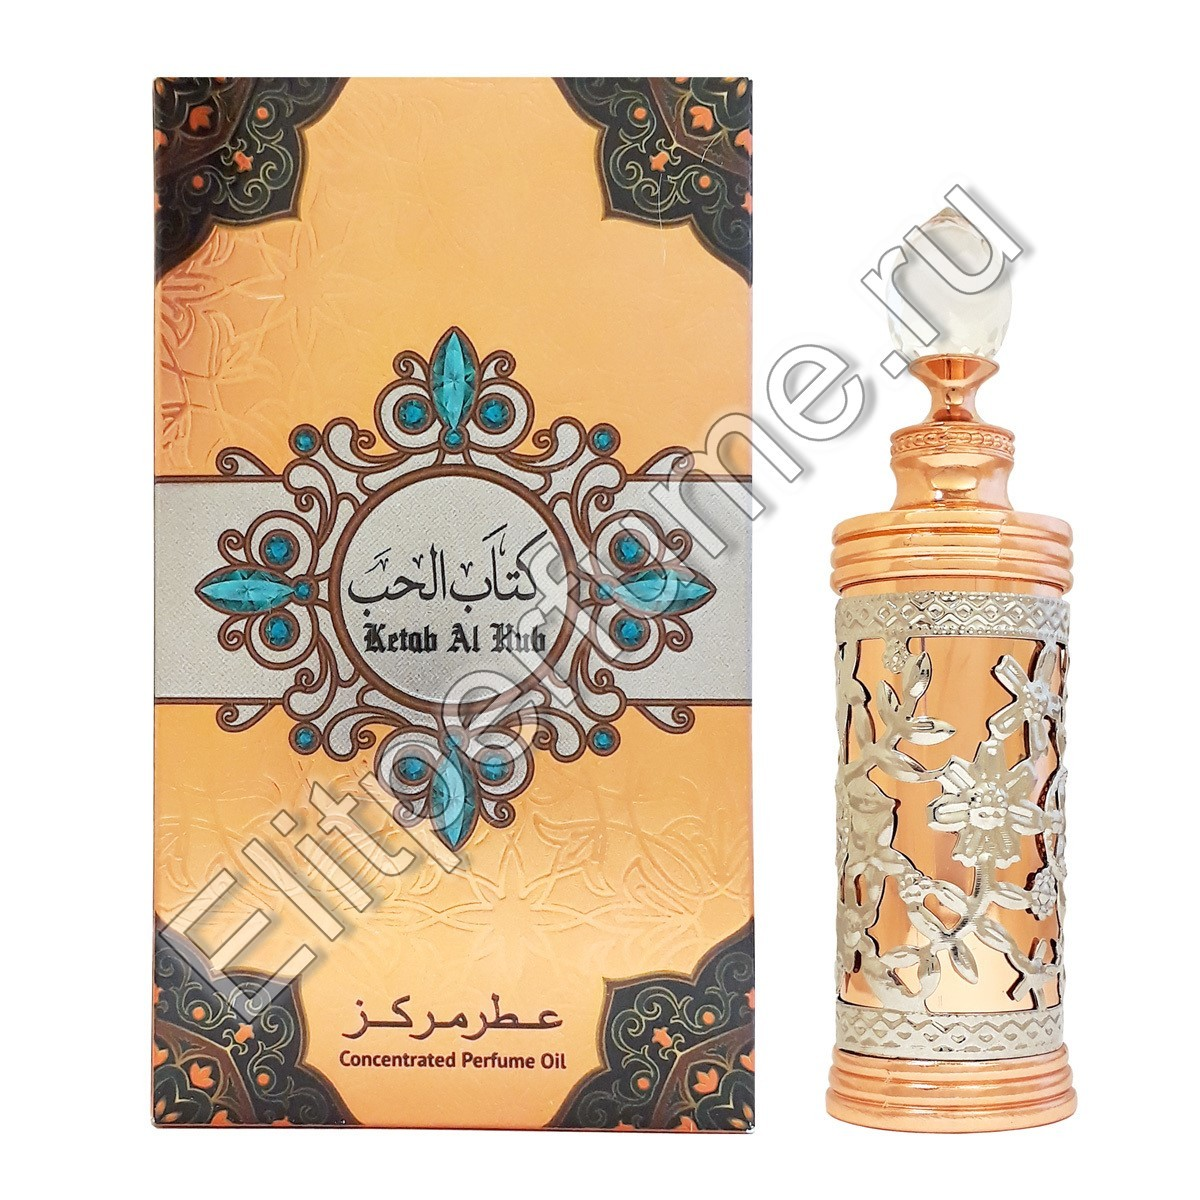 Ketab al Hub / Кетаб аль Хуб 12 мл арабские масляные духи от Халис Khalis Perfumes